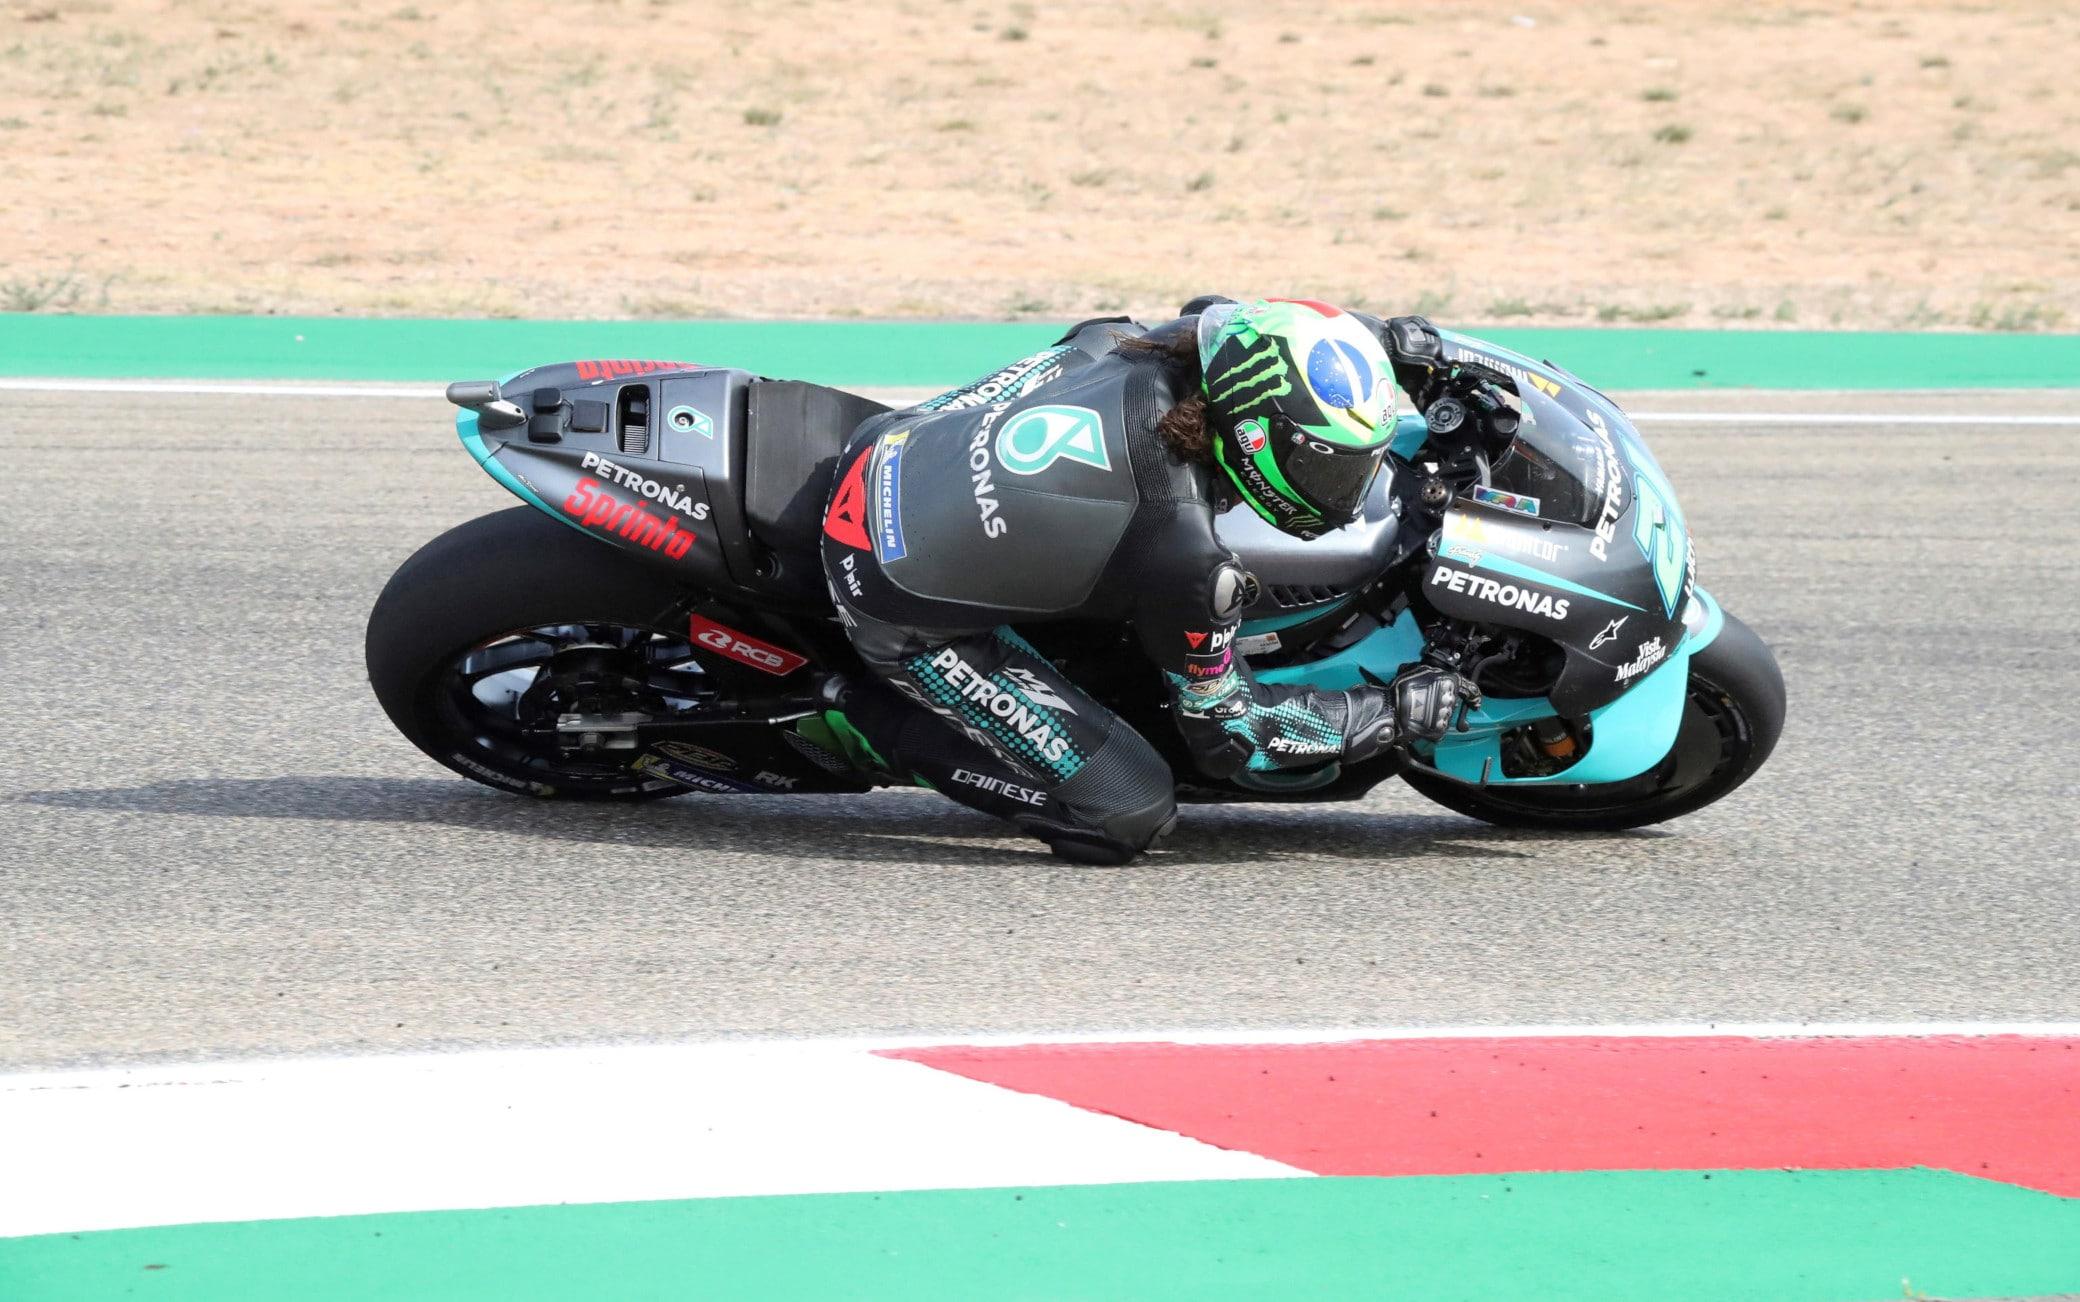 Moto: Teruel; vince Morbidelli su Yamaha Petronas - Ultima Ora